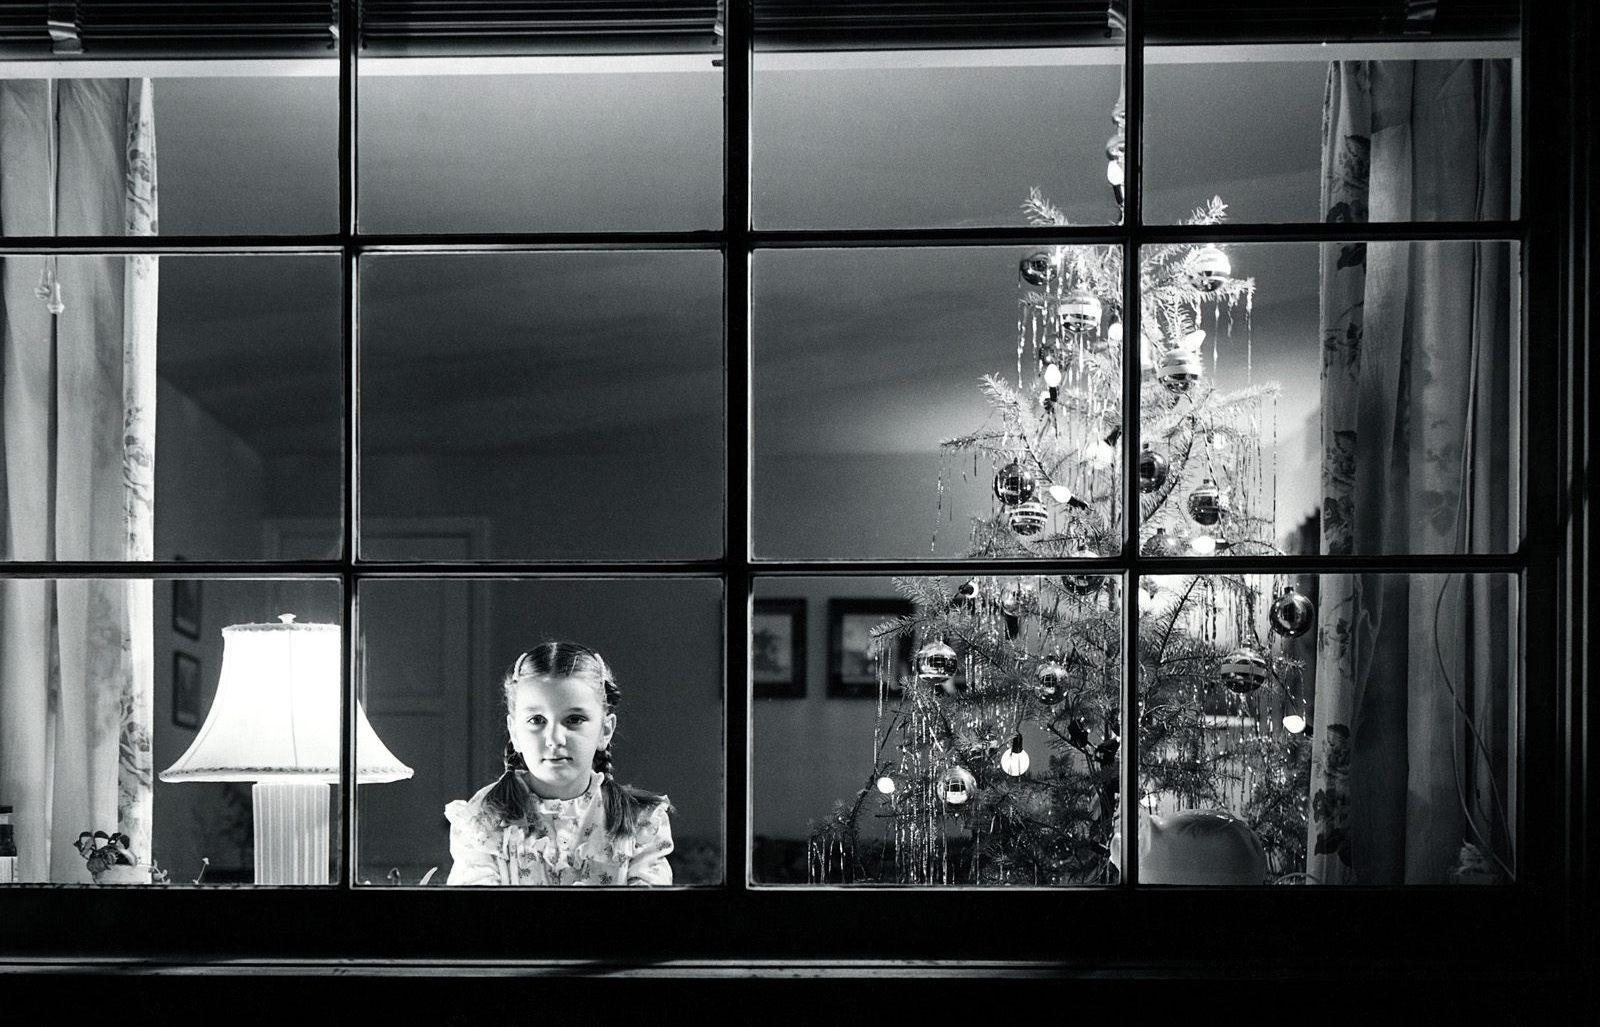 http://1.bp.blogspot.com/_kOXCCHqjAis/TRTSJjlwn9I/AAAAAAAAAbk/Gjb7mz-wgUk/s1600/christmas-eve-tree-silver.jpg